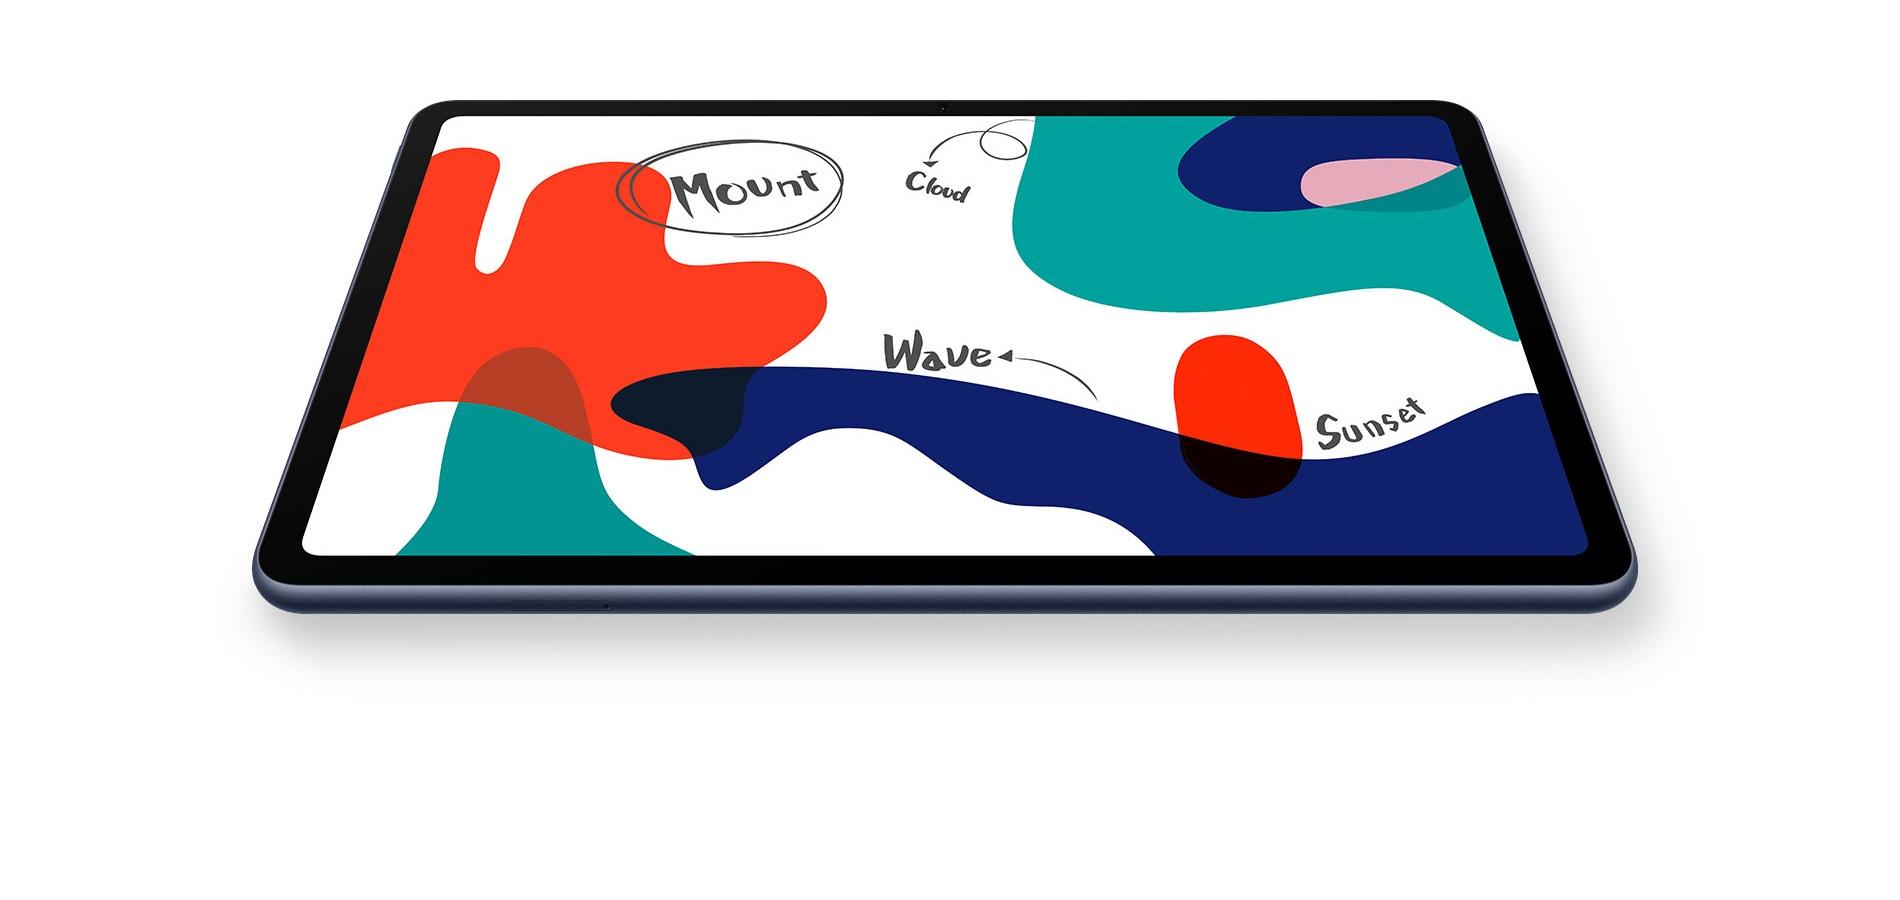 Huawei MatePad tablet